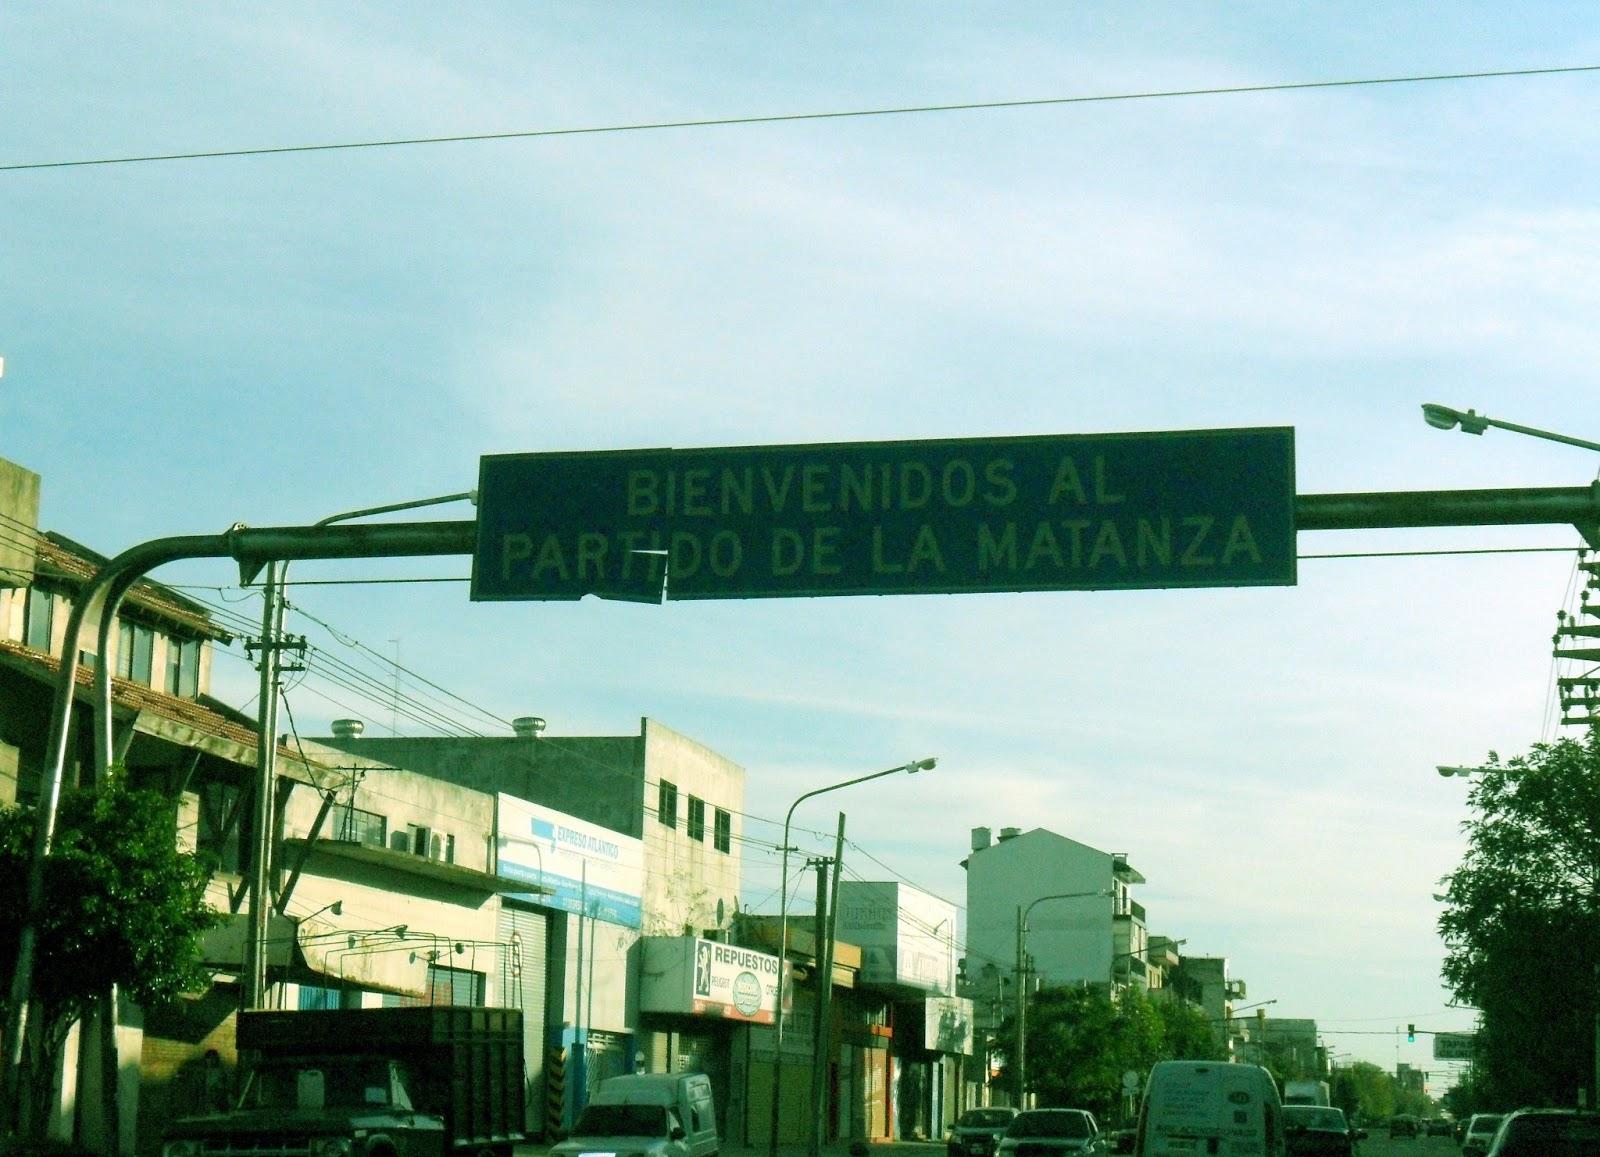 Nora coria v feria del libro municipalidad de la matanza for Municipalidad la matanza